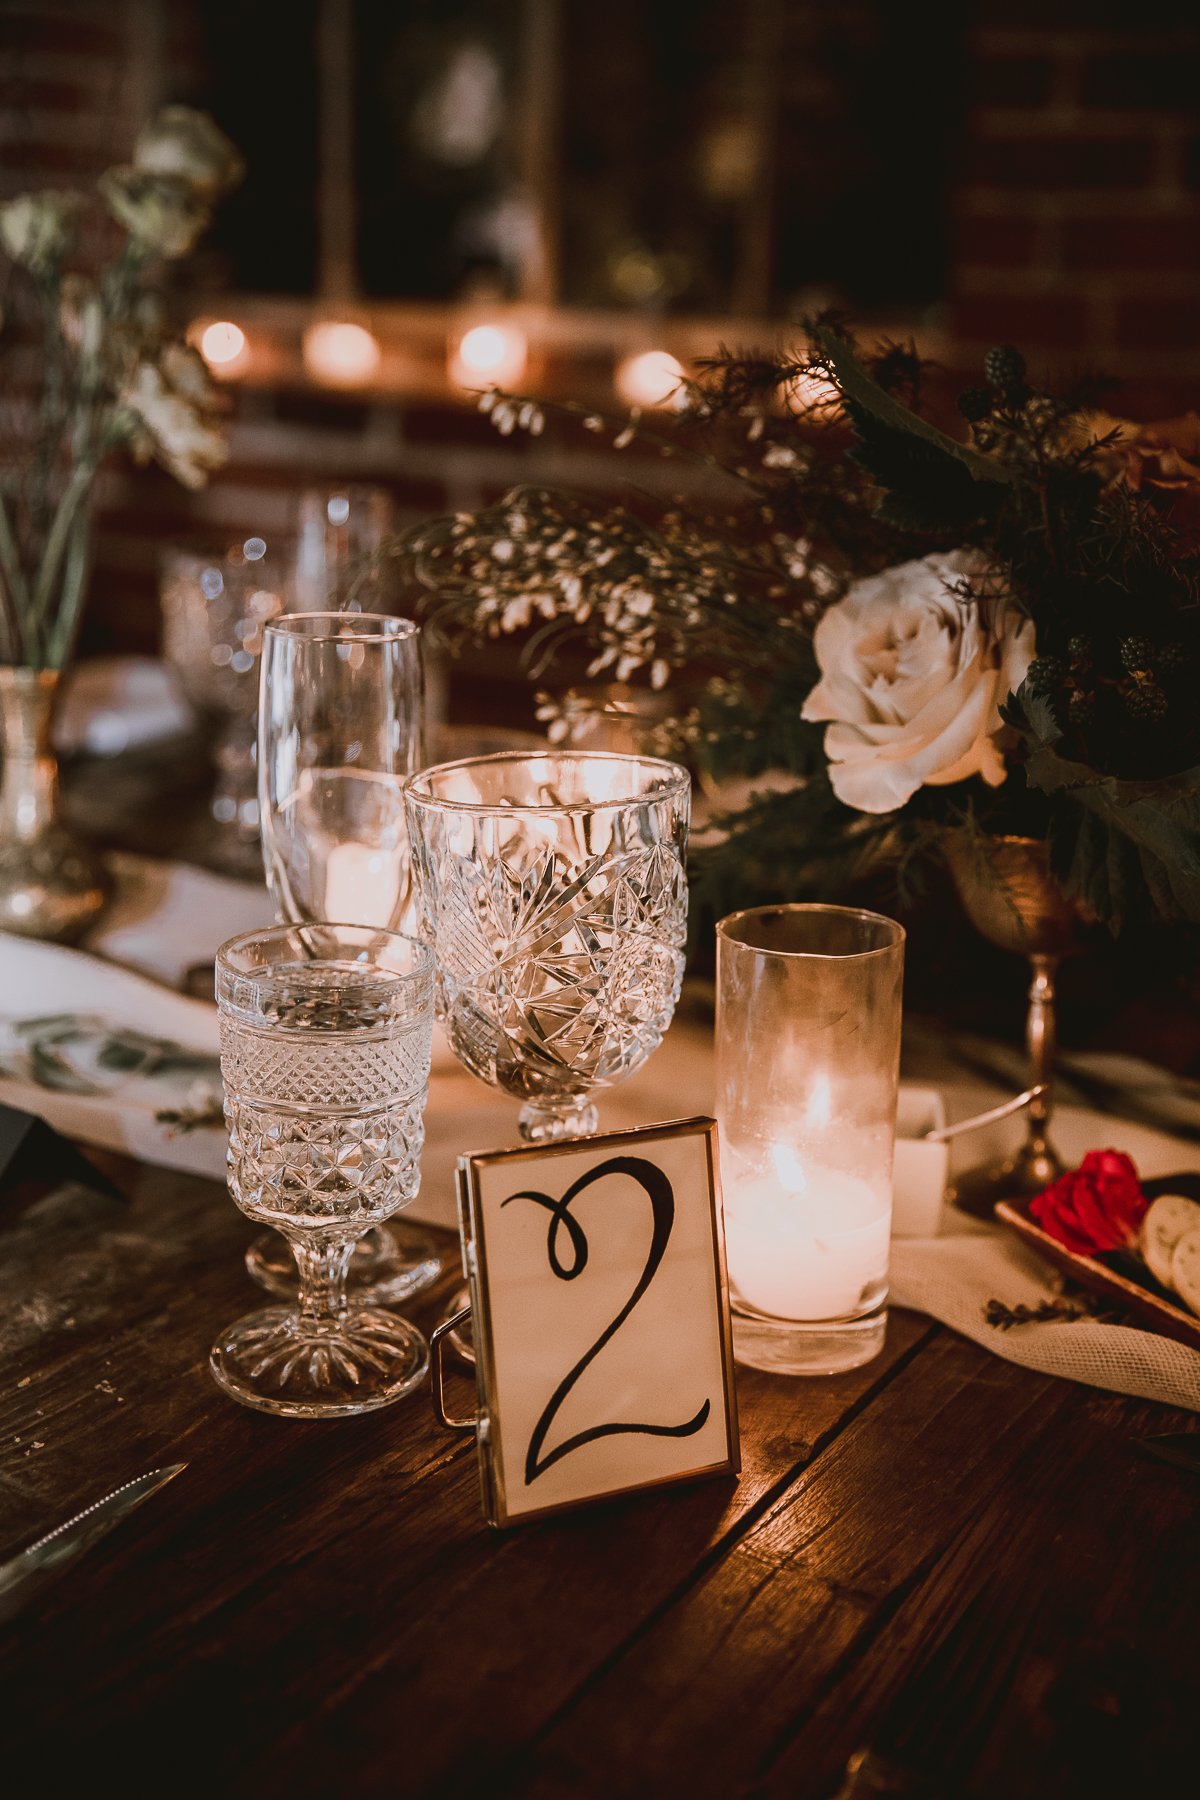 carondelet-house-kelley-raye-los-angeles-wedding-photographer-118.jpg